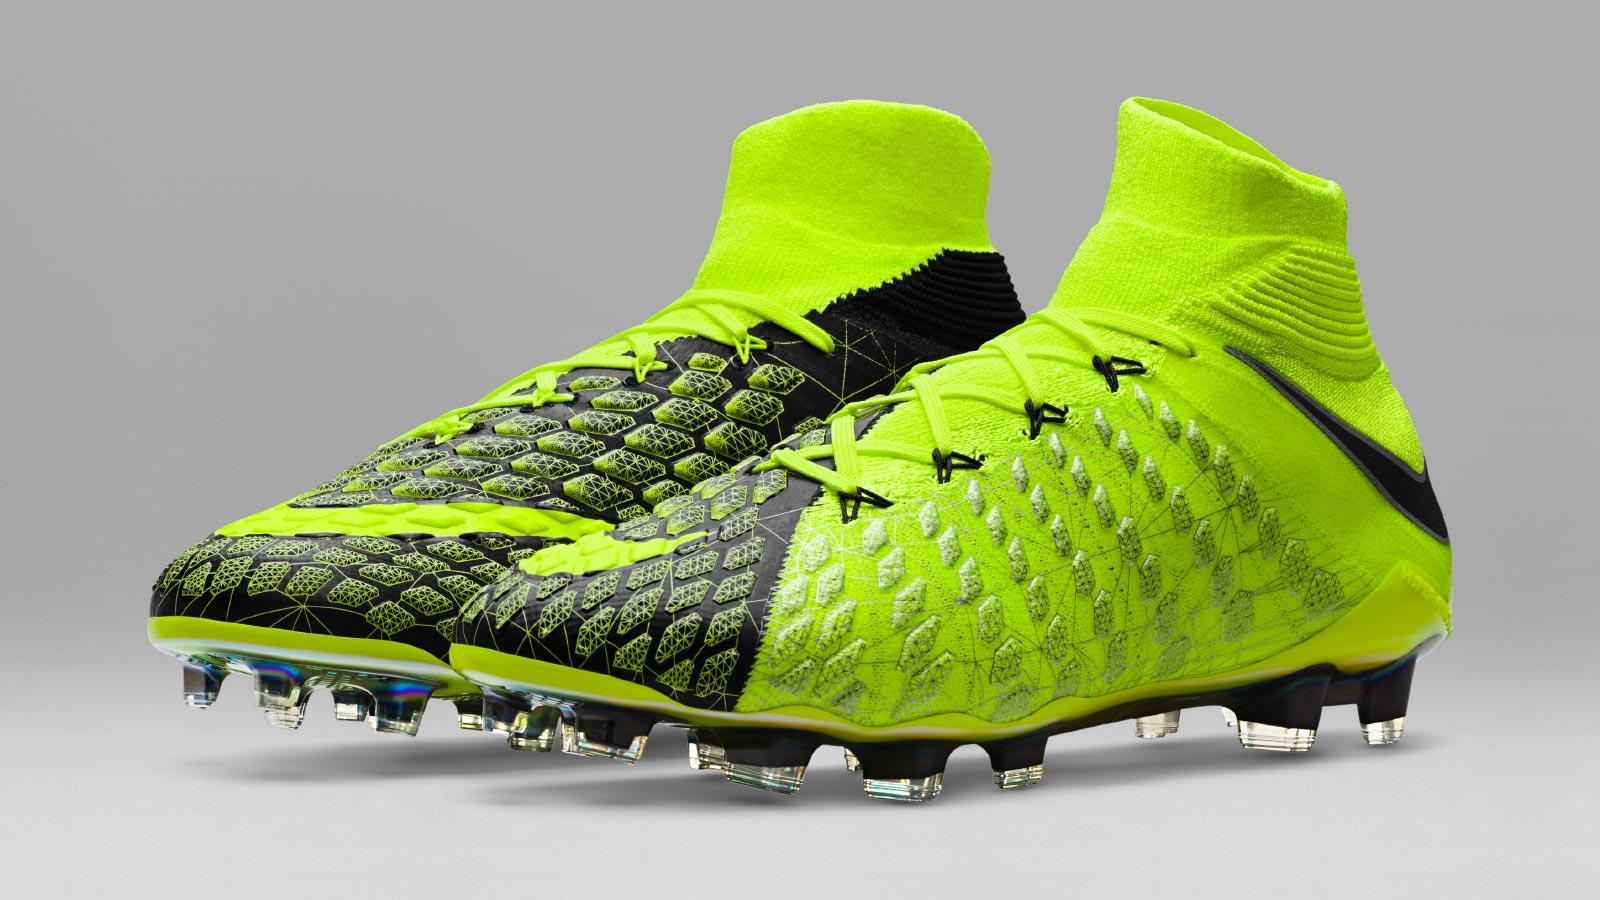 Fifa soccer footwear fifa world cup 2018 draw manipulated